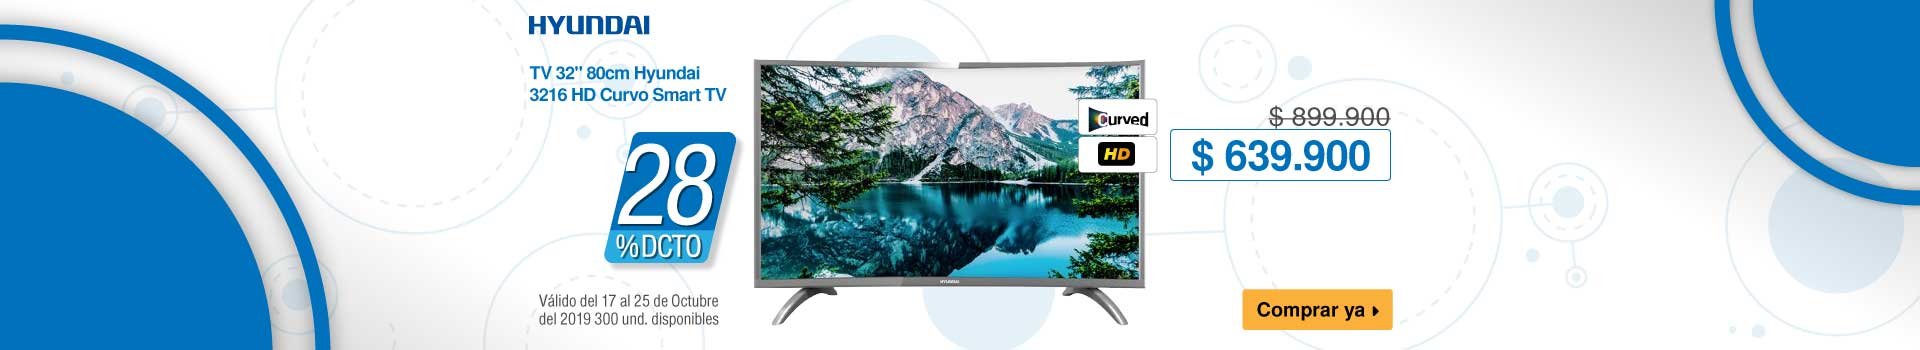 AK-KT-TV-HYUNDAI-3216-HIPER4-19OCT